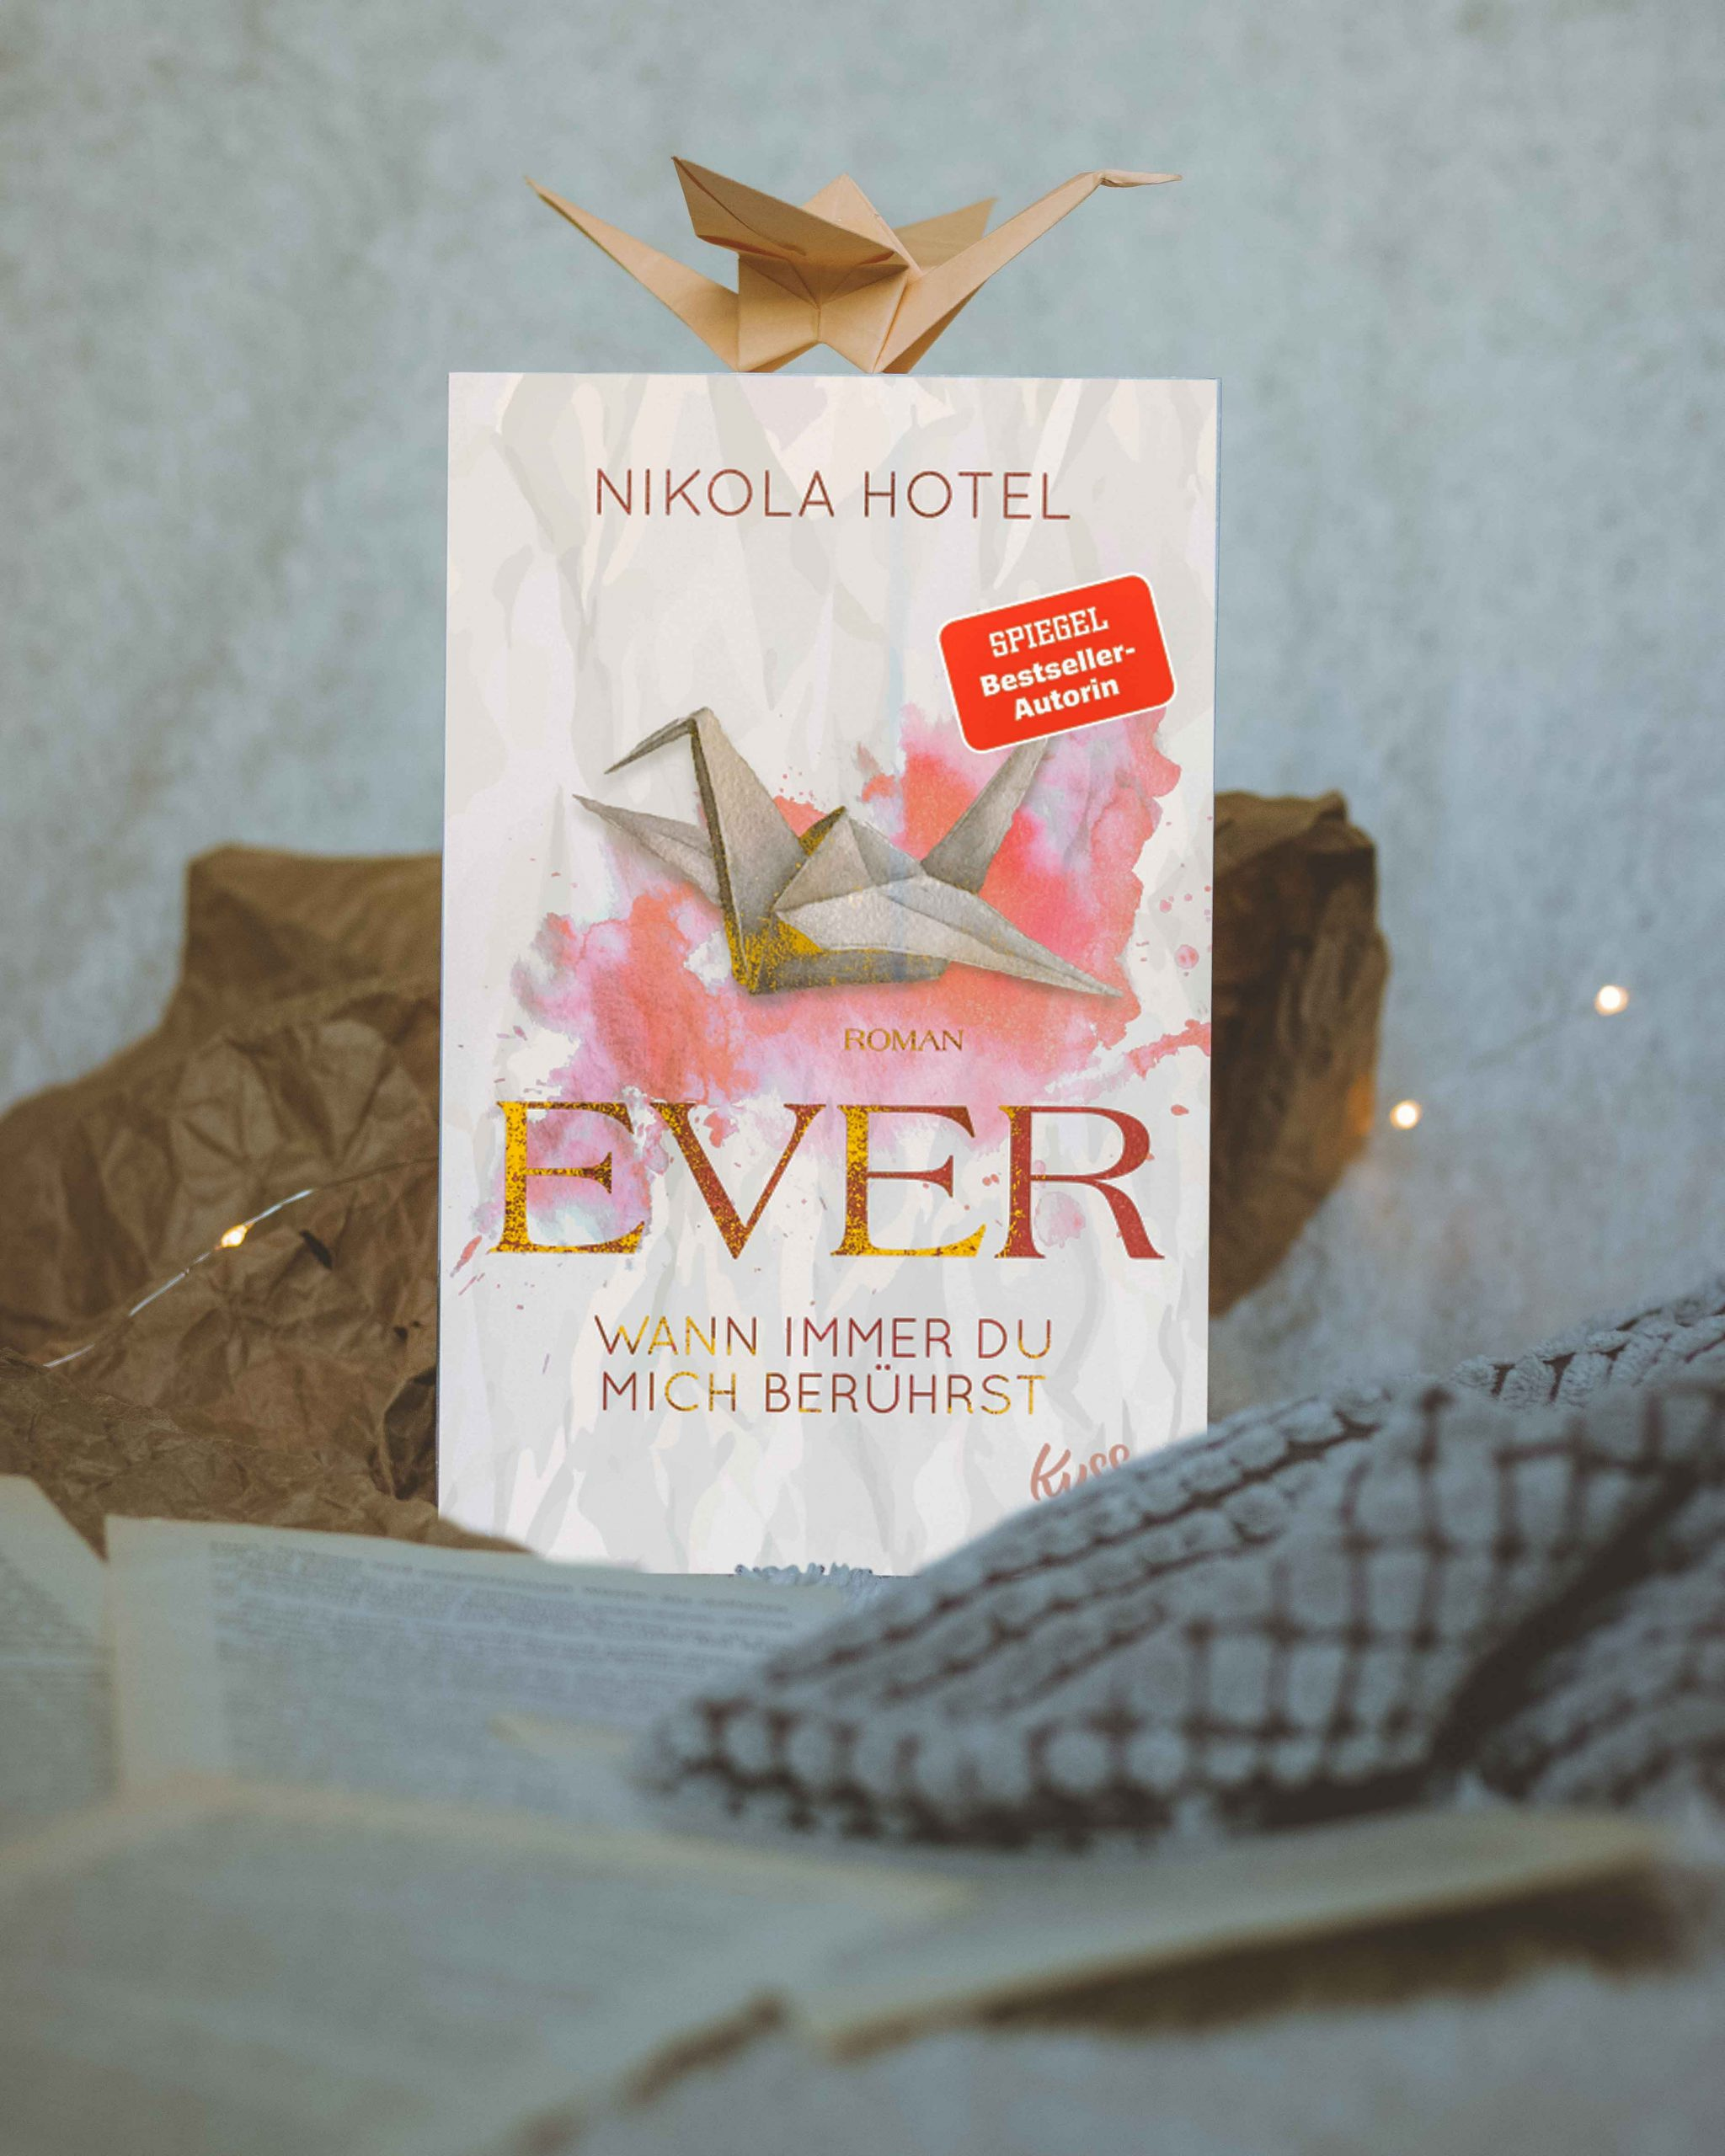 Ever – Wann immer du mich berührst | Nikola Hotel